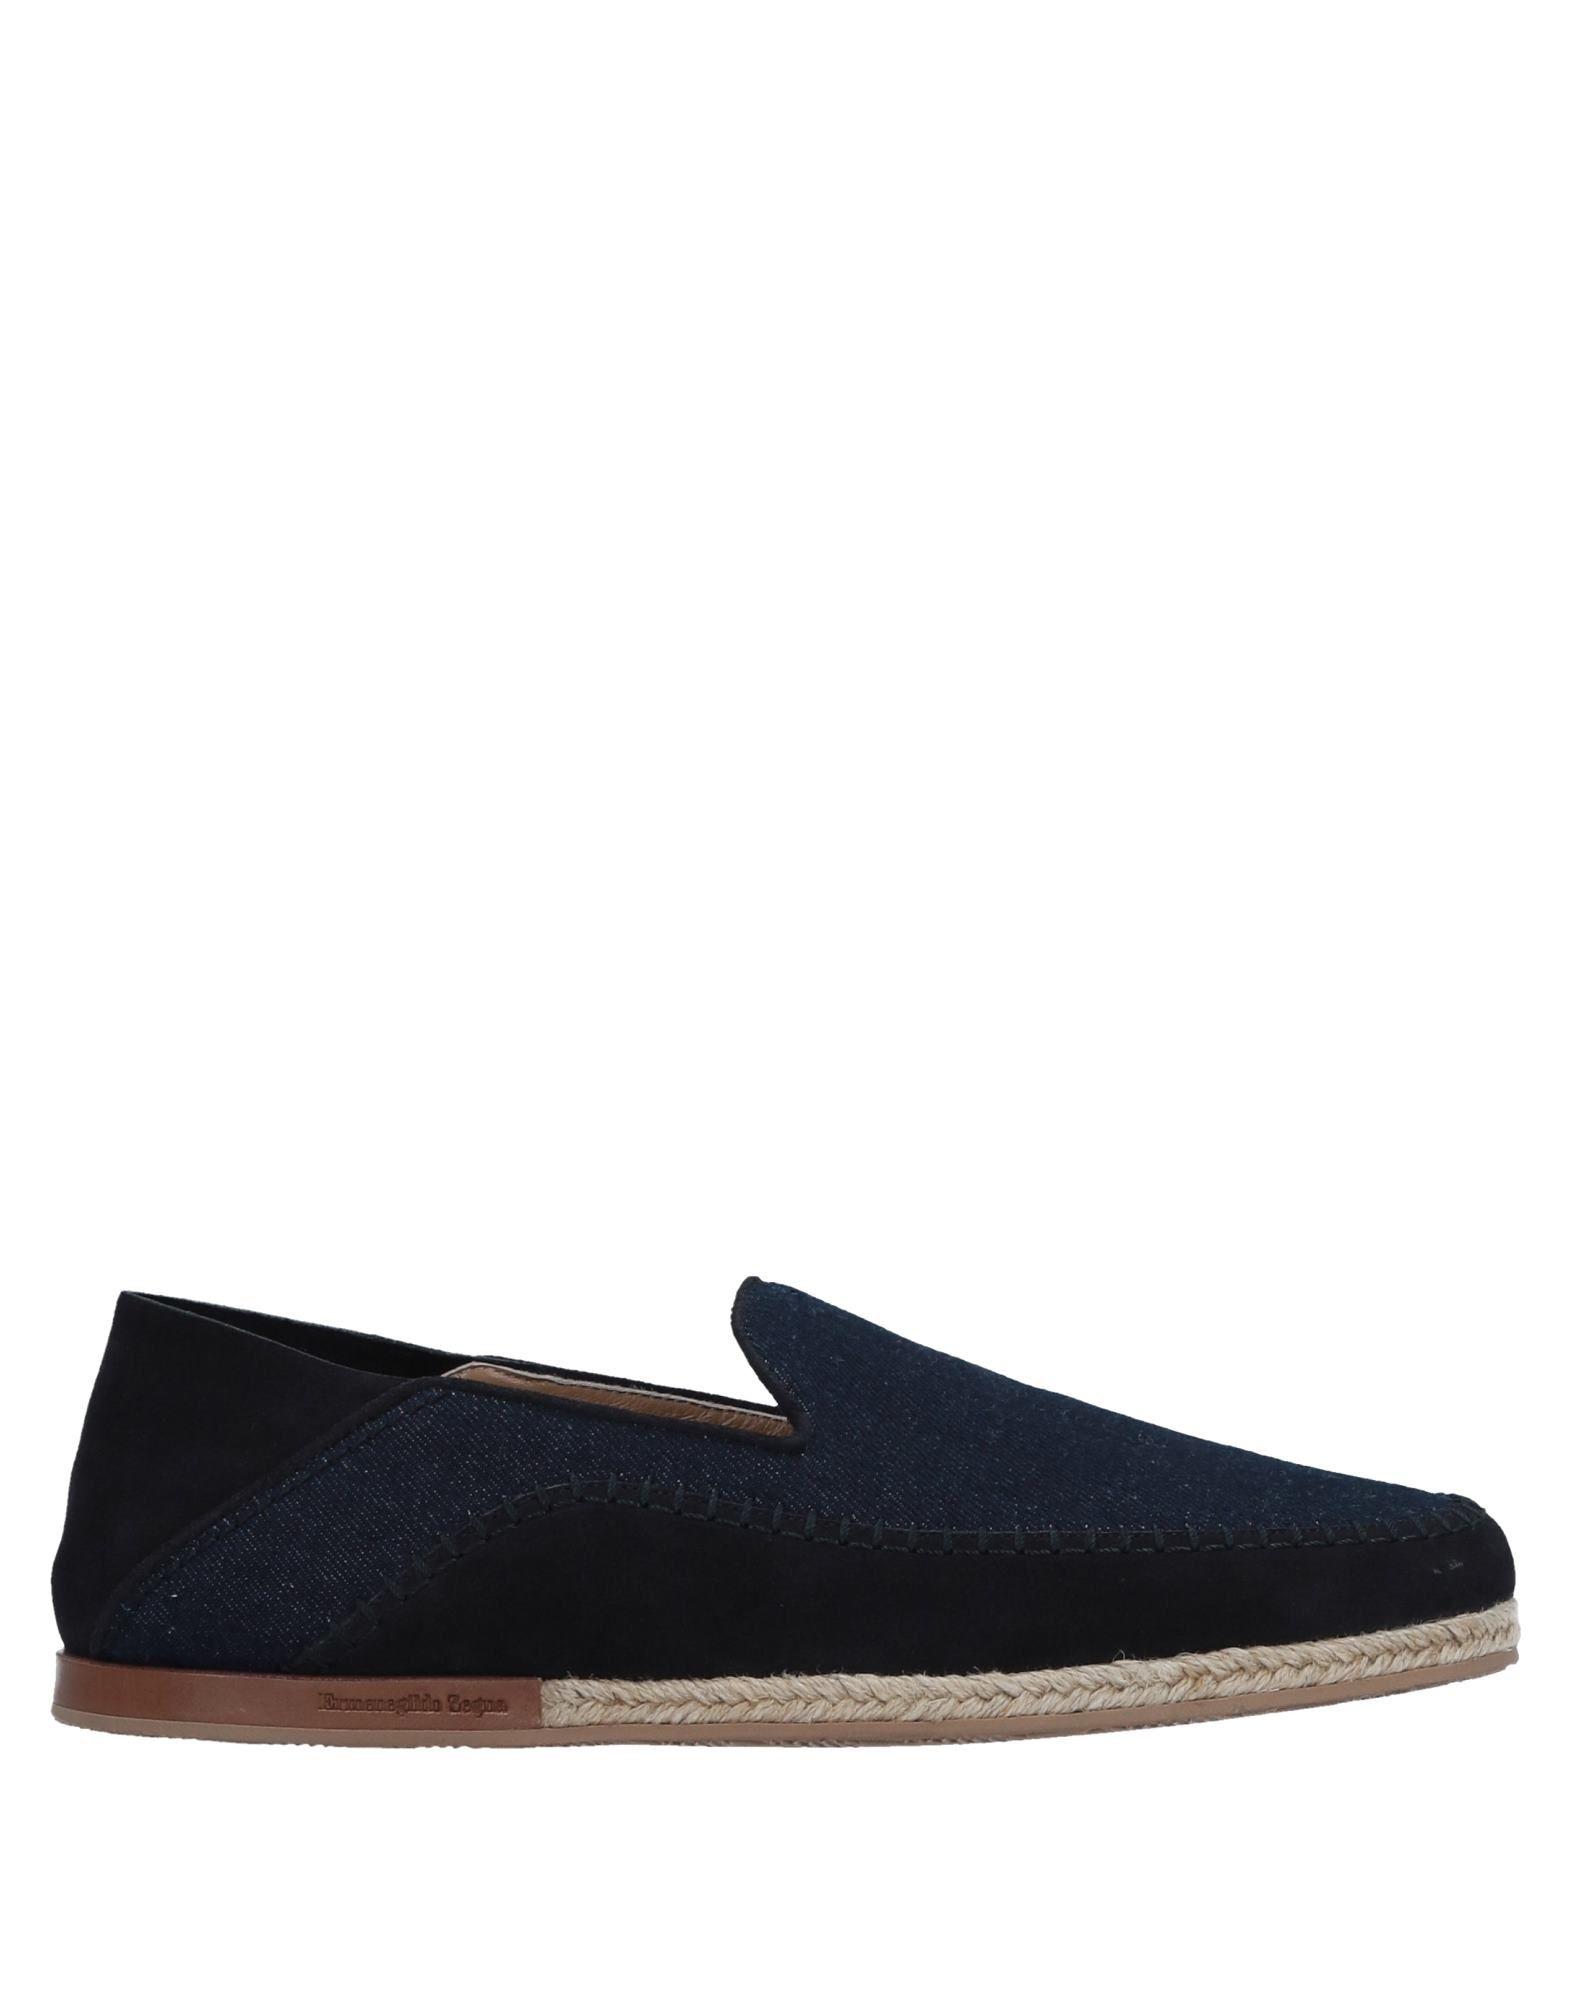 Ermenegildo Zegna Gute Mokassins Herren  11518785NV Gute Zegna Qualität beliebte Schuhe 8ae084